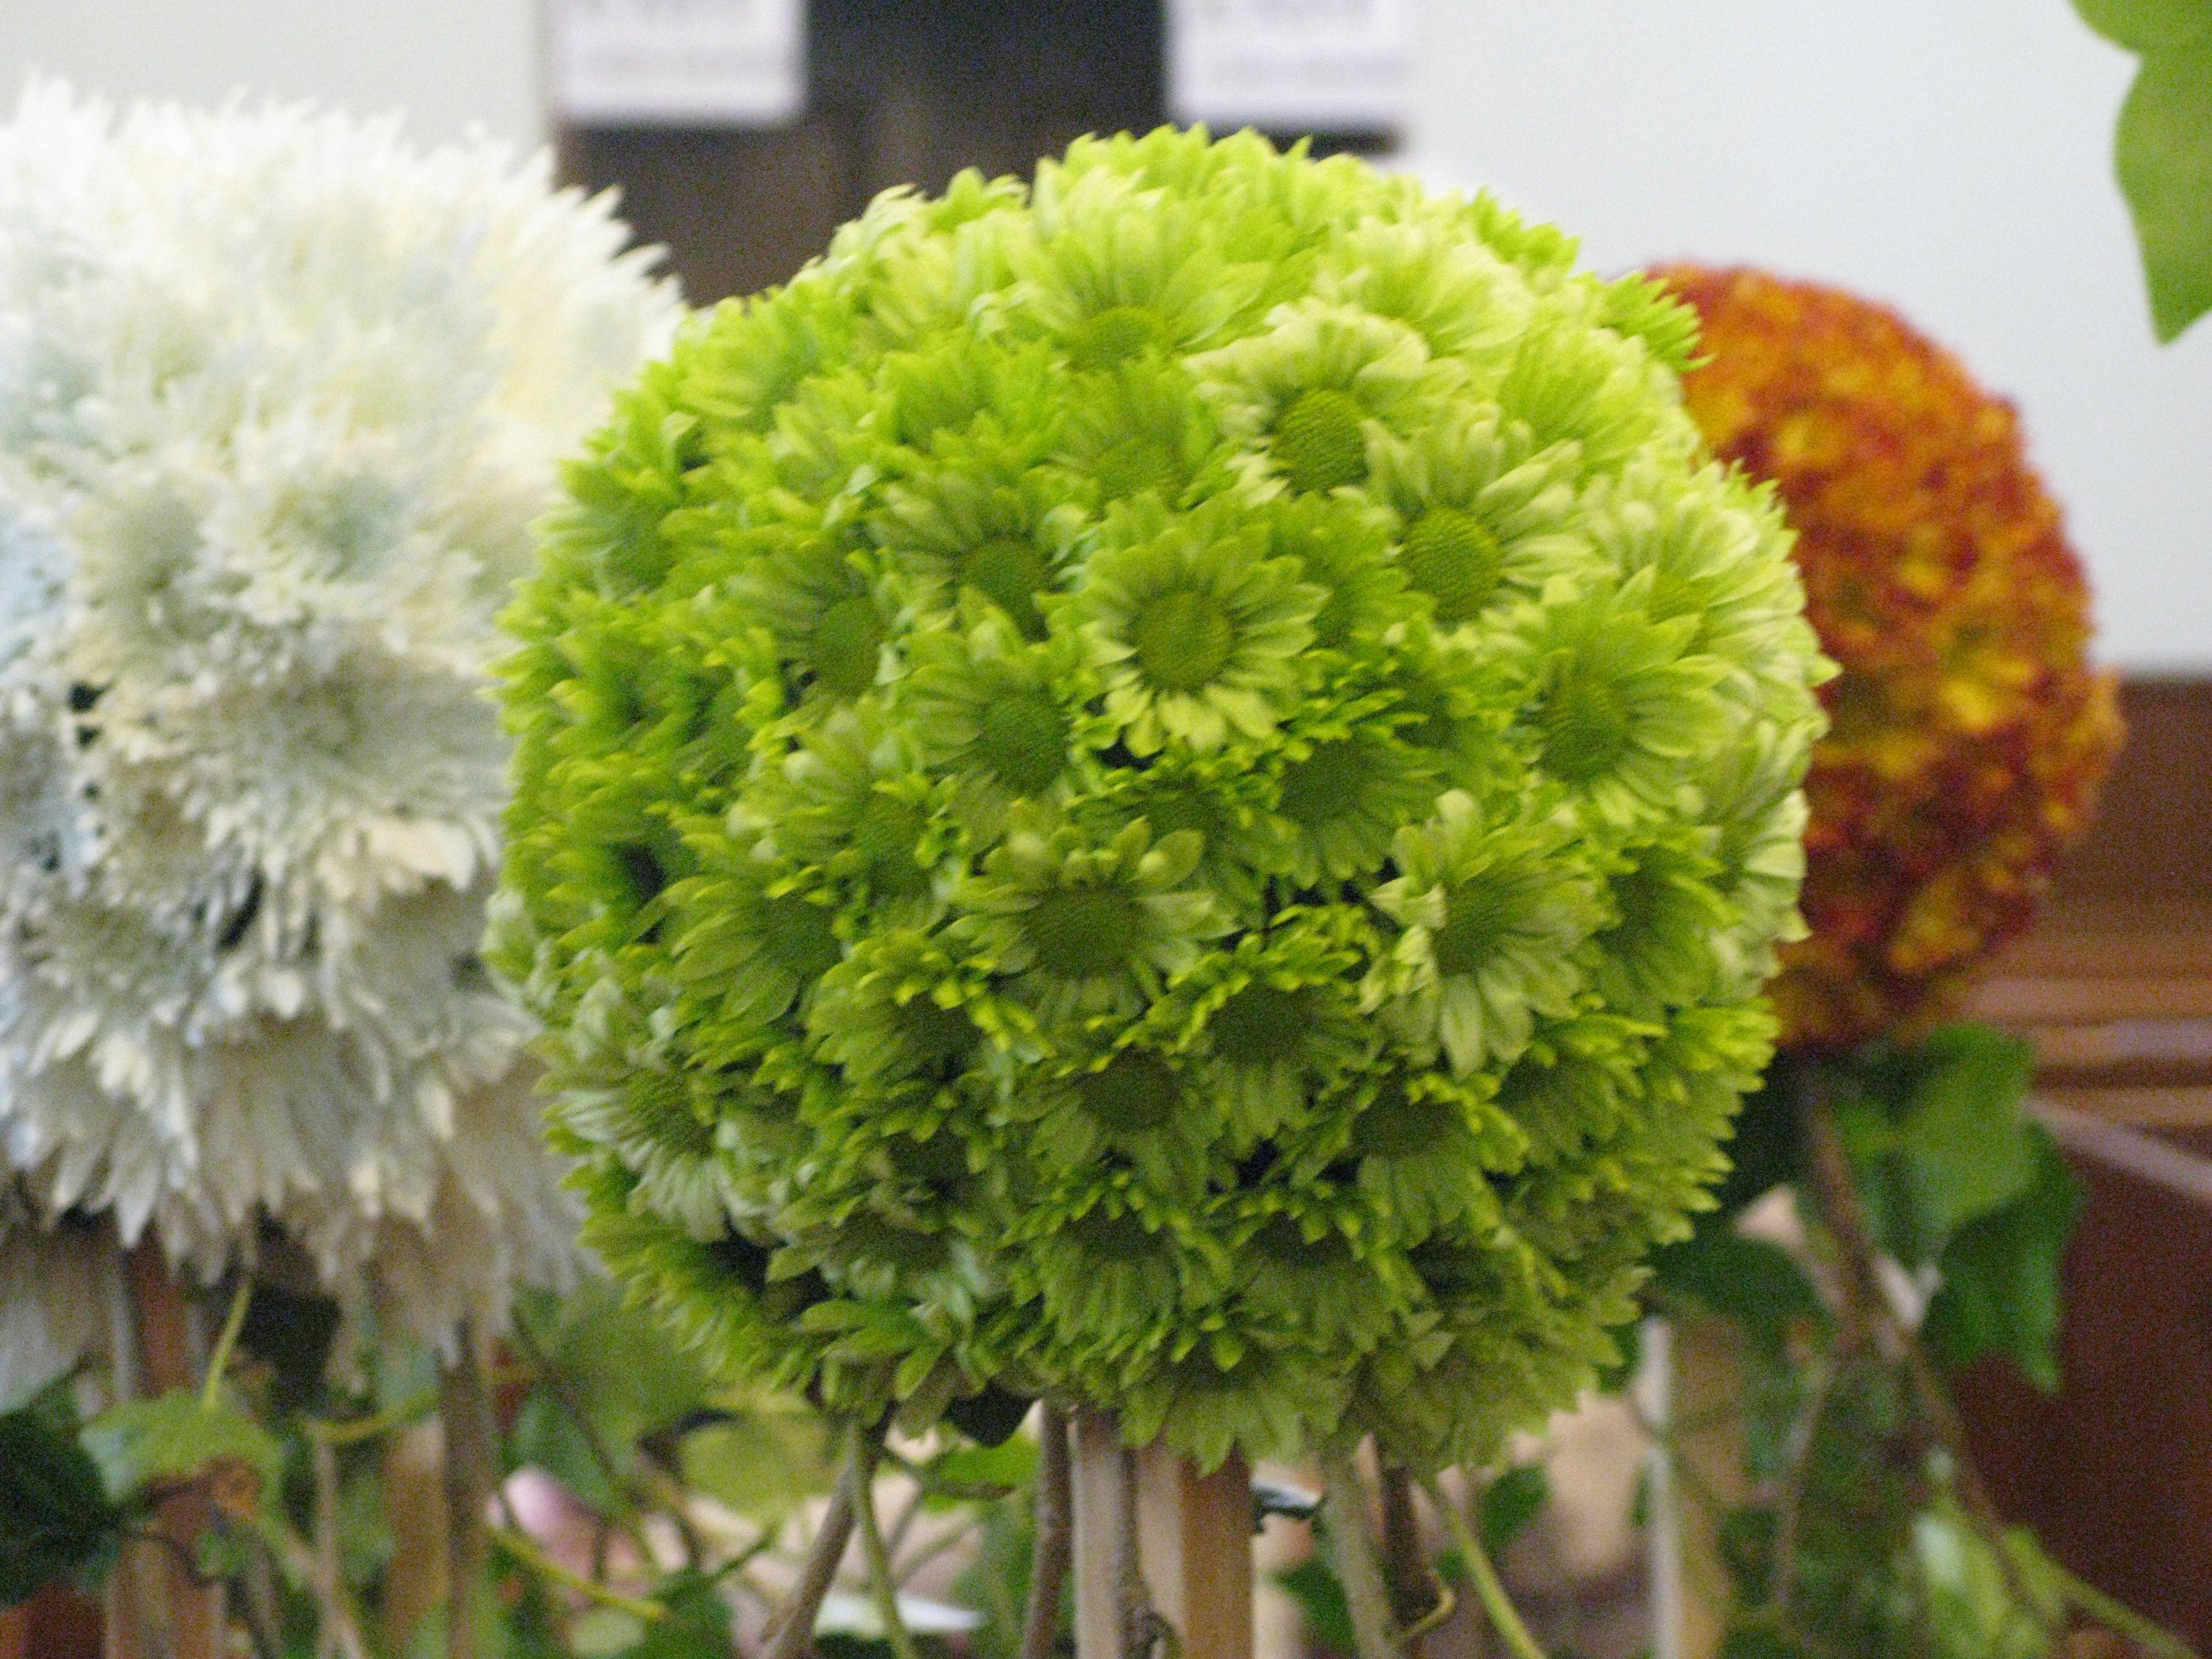 Chrysanthemum balls made using round oasis floral foam